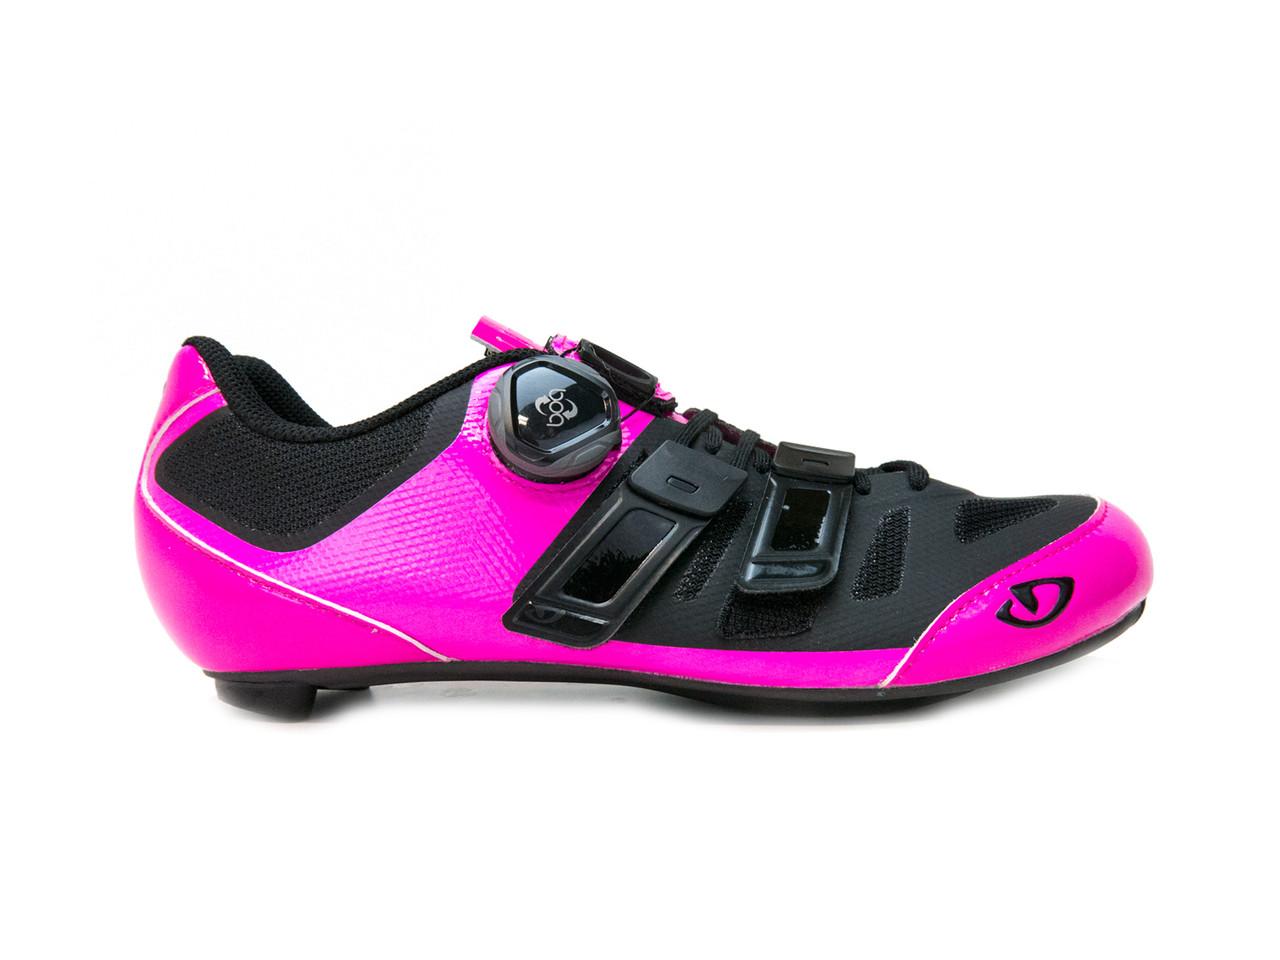 Giro Raes Techlace Bright Pink//Black Womens Road Bike Shoes Size 37